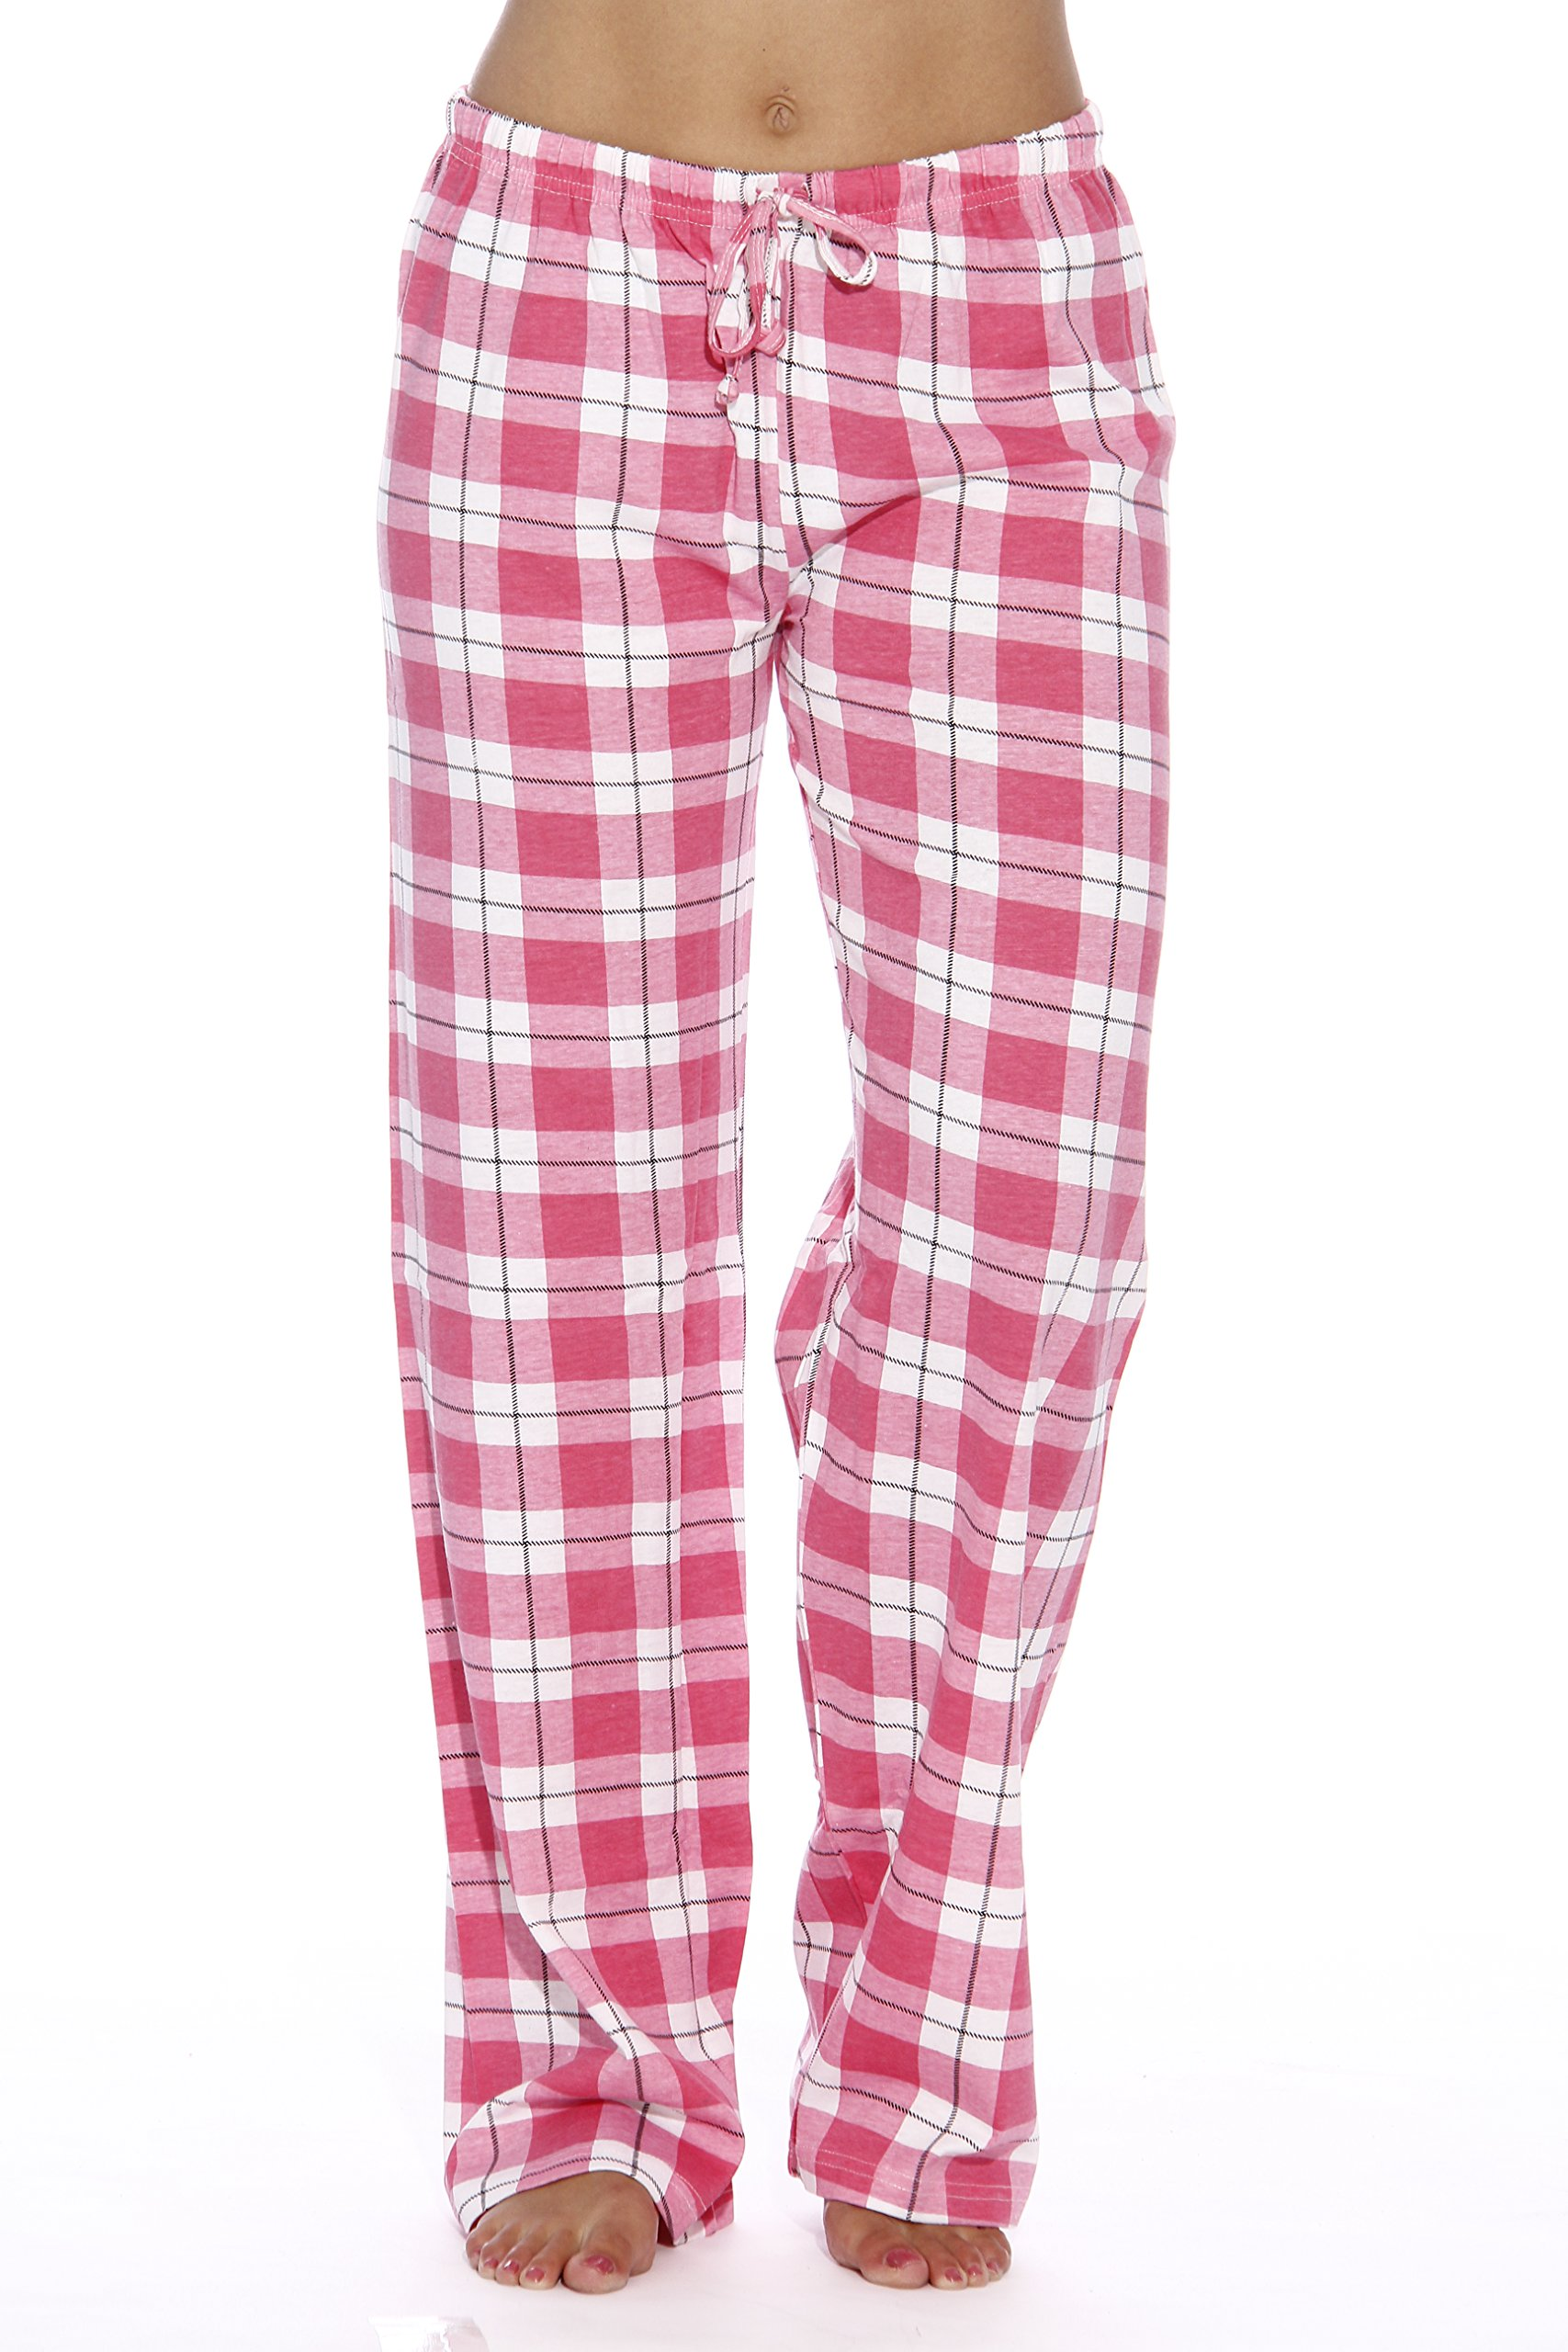 6324-10018-M Just Love Women Pajama Pants / Sleepwear, Plaid Pink